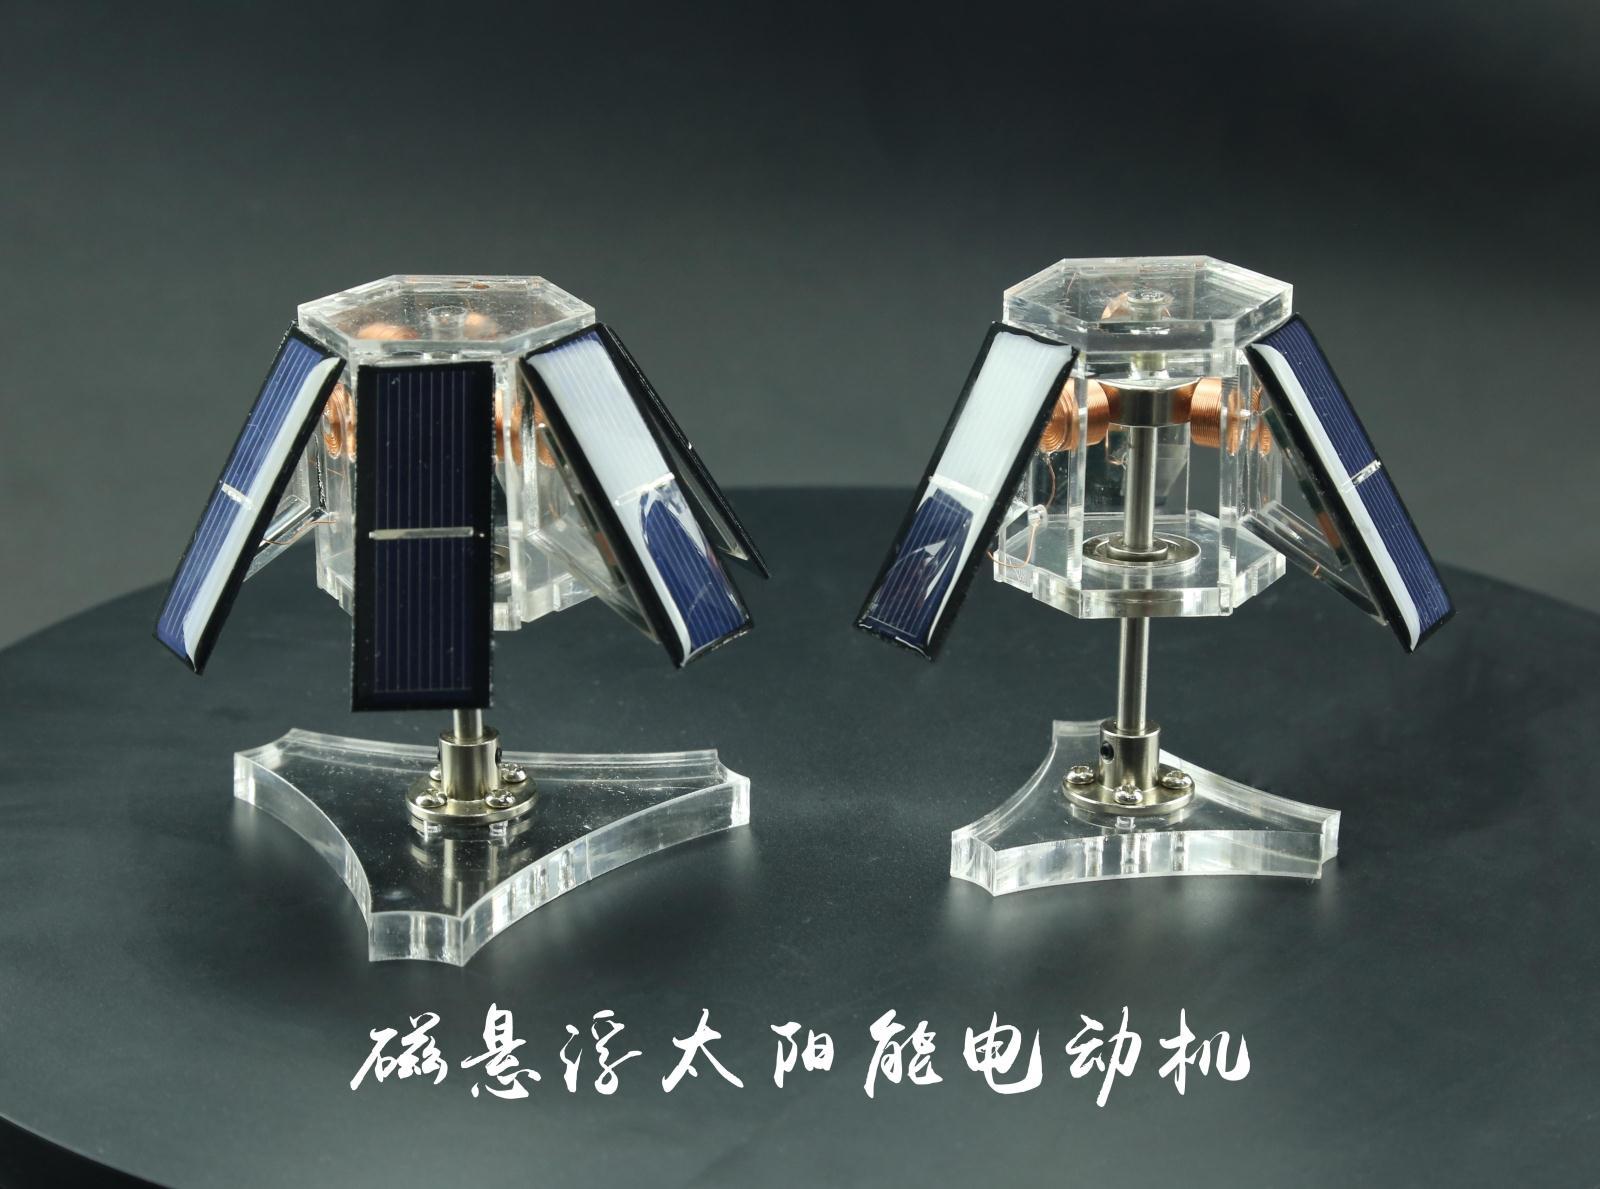 Solar magnetic motor magnetic creative ornaments<br>